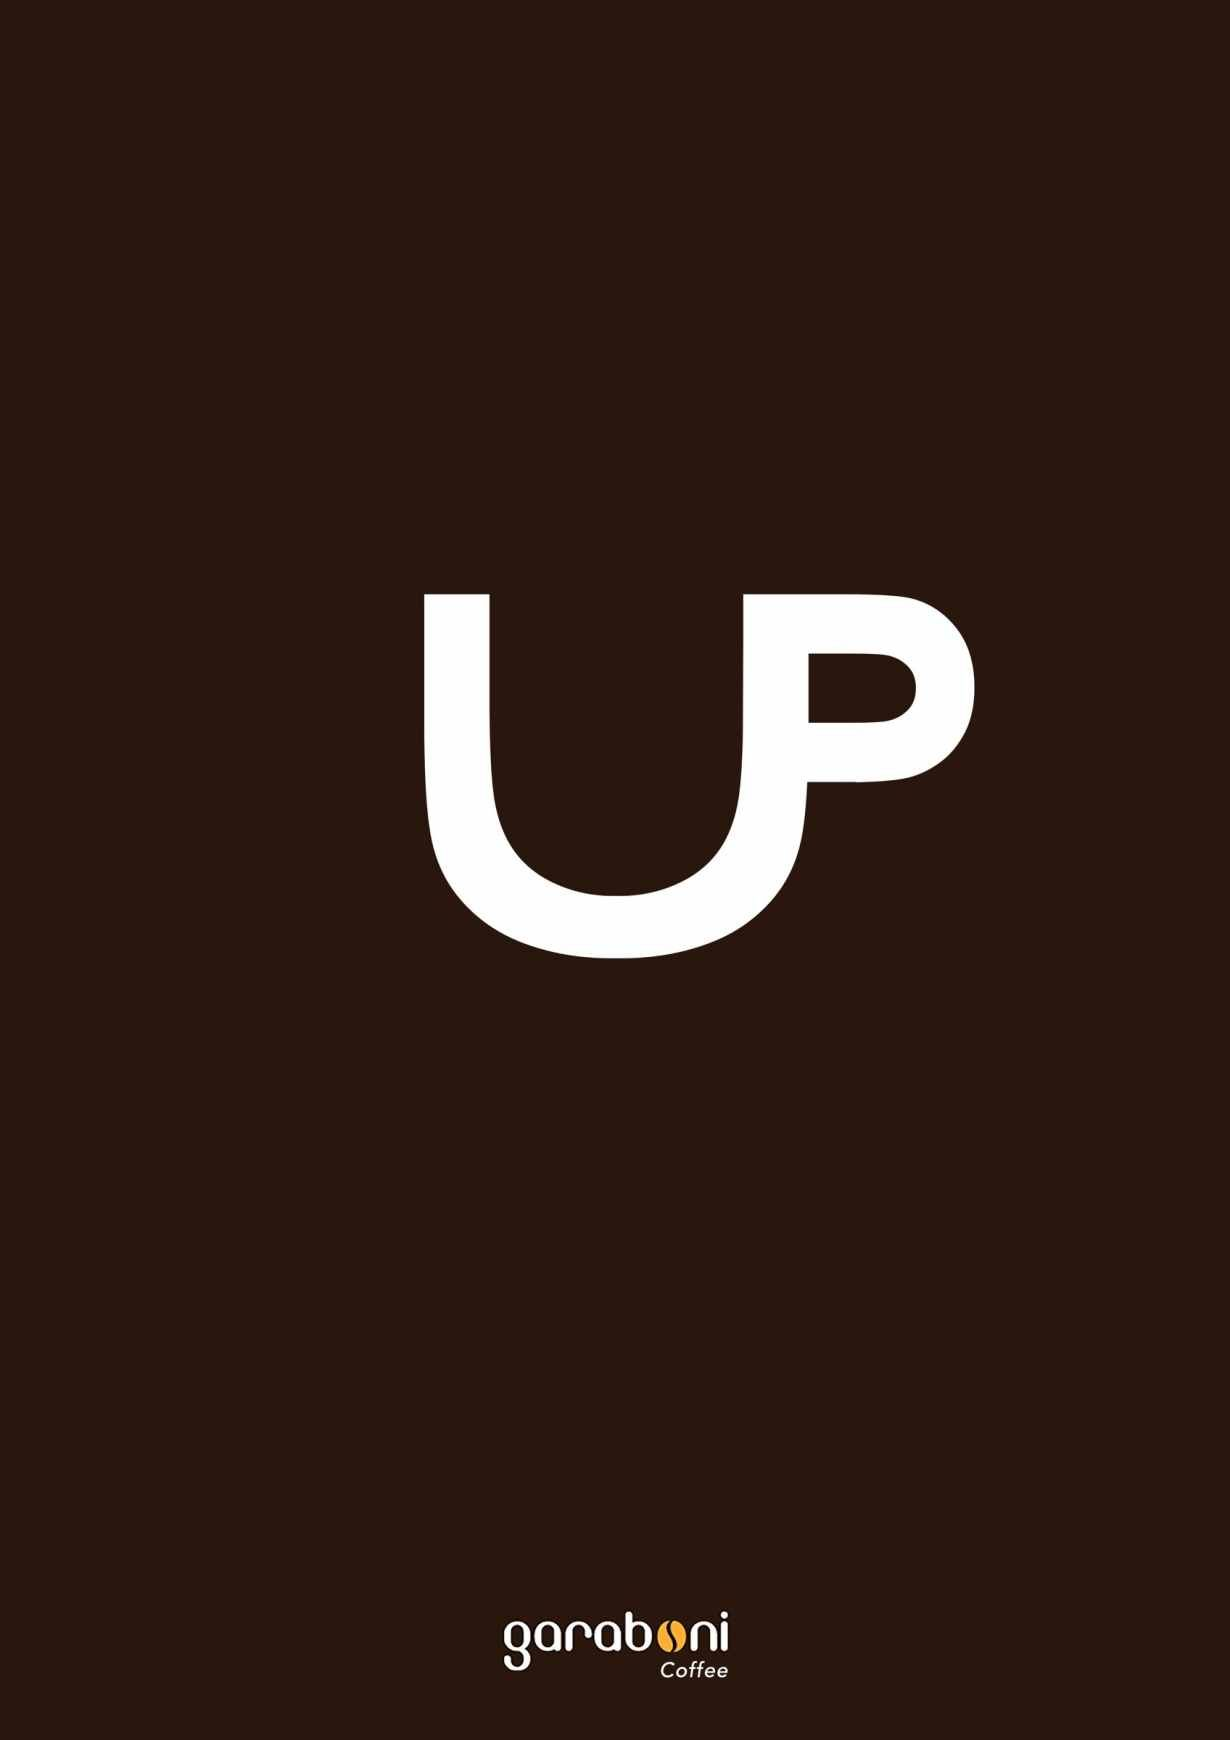 Garaboni Coffee Up Coffee Advertising Coffee Logo Cafe Names